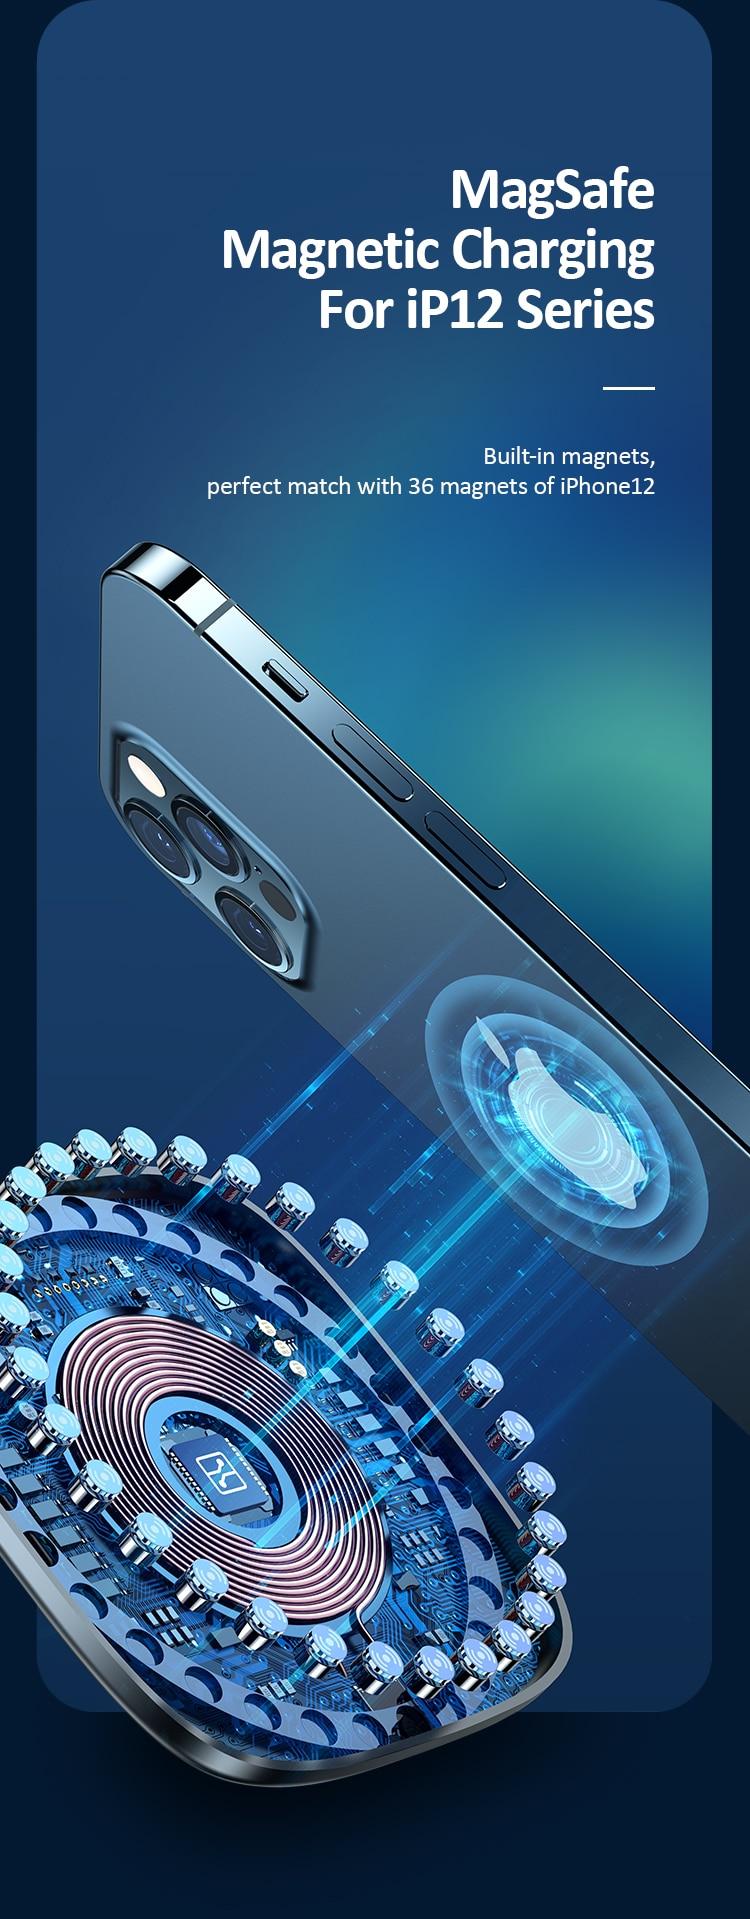 W1-苹果超薄磁吸无线快充充电器带线款-US-CD159_02